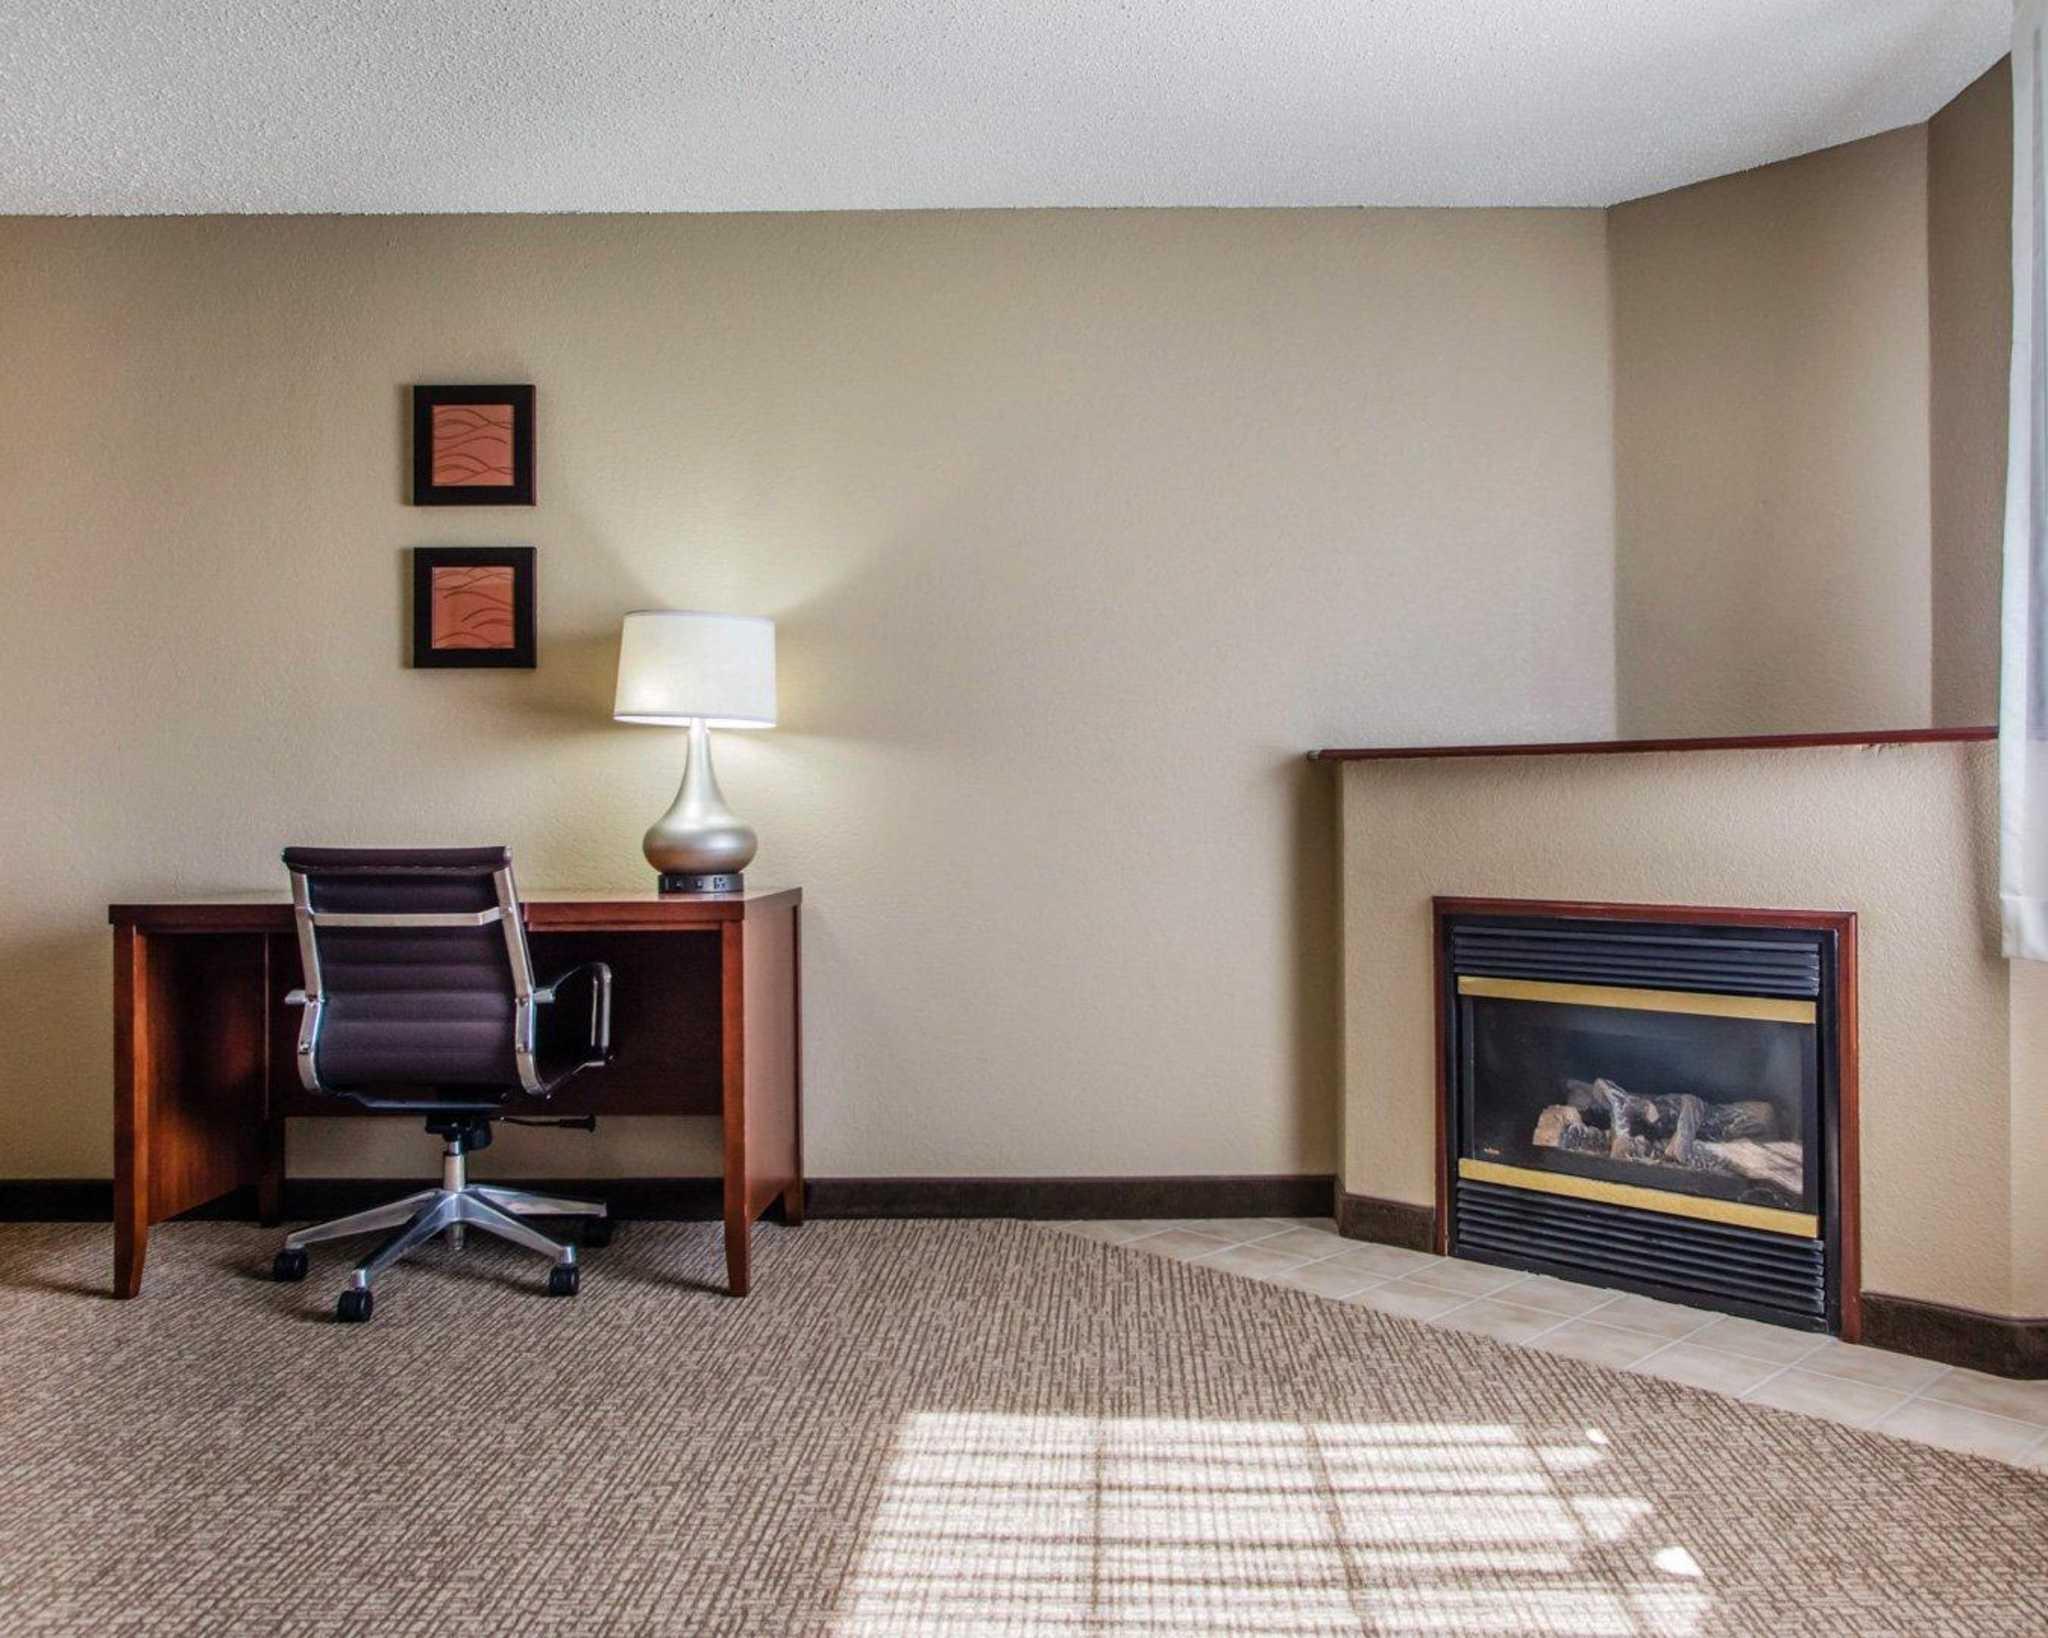 Comfort Inn & Suites Jackson - West Bend image 12